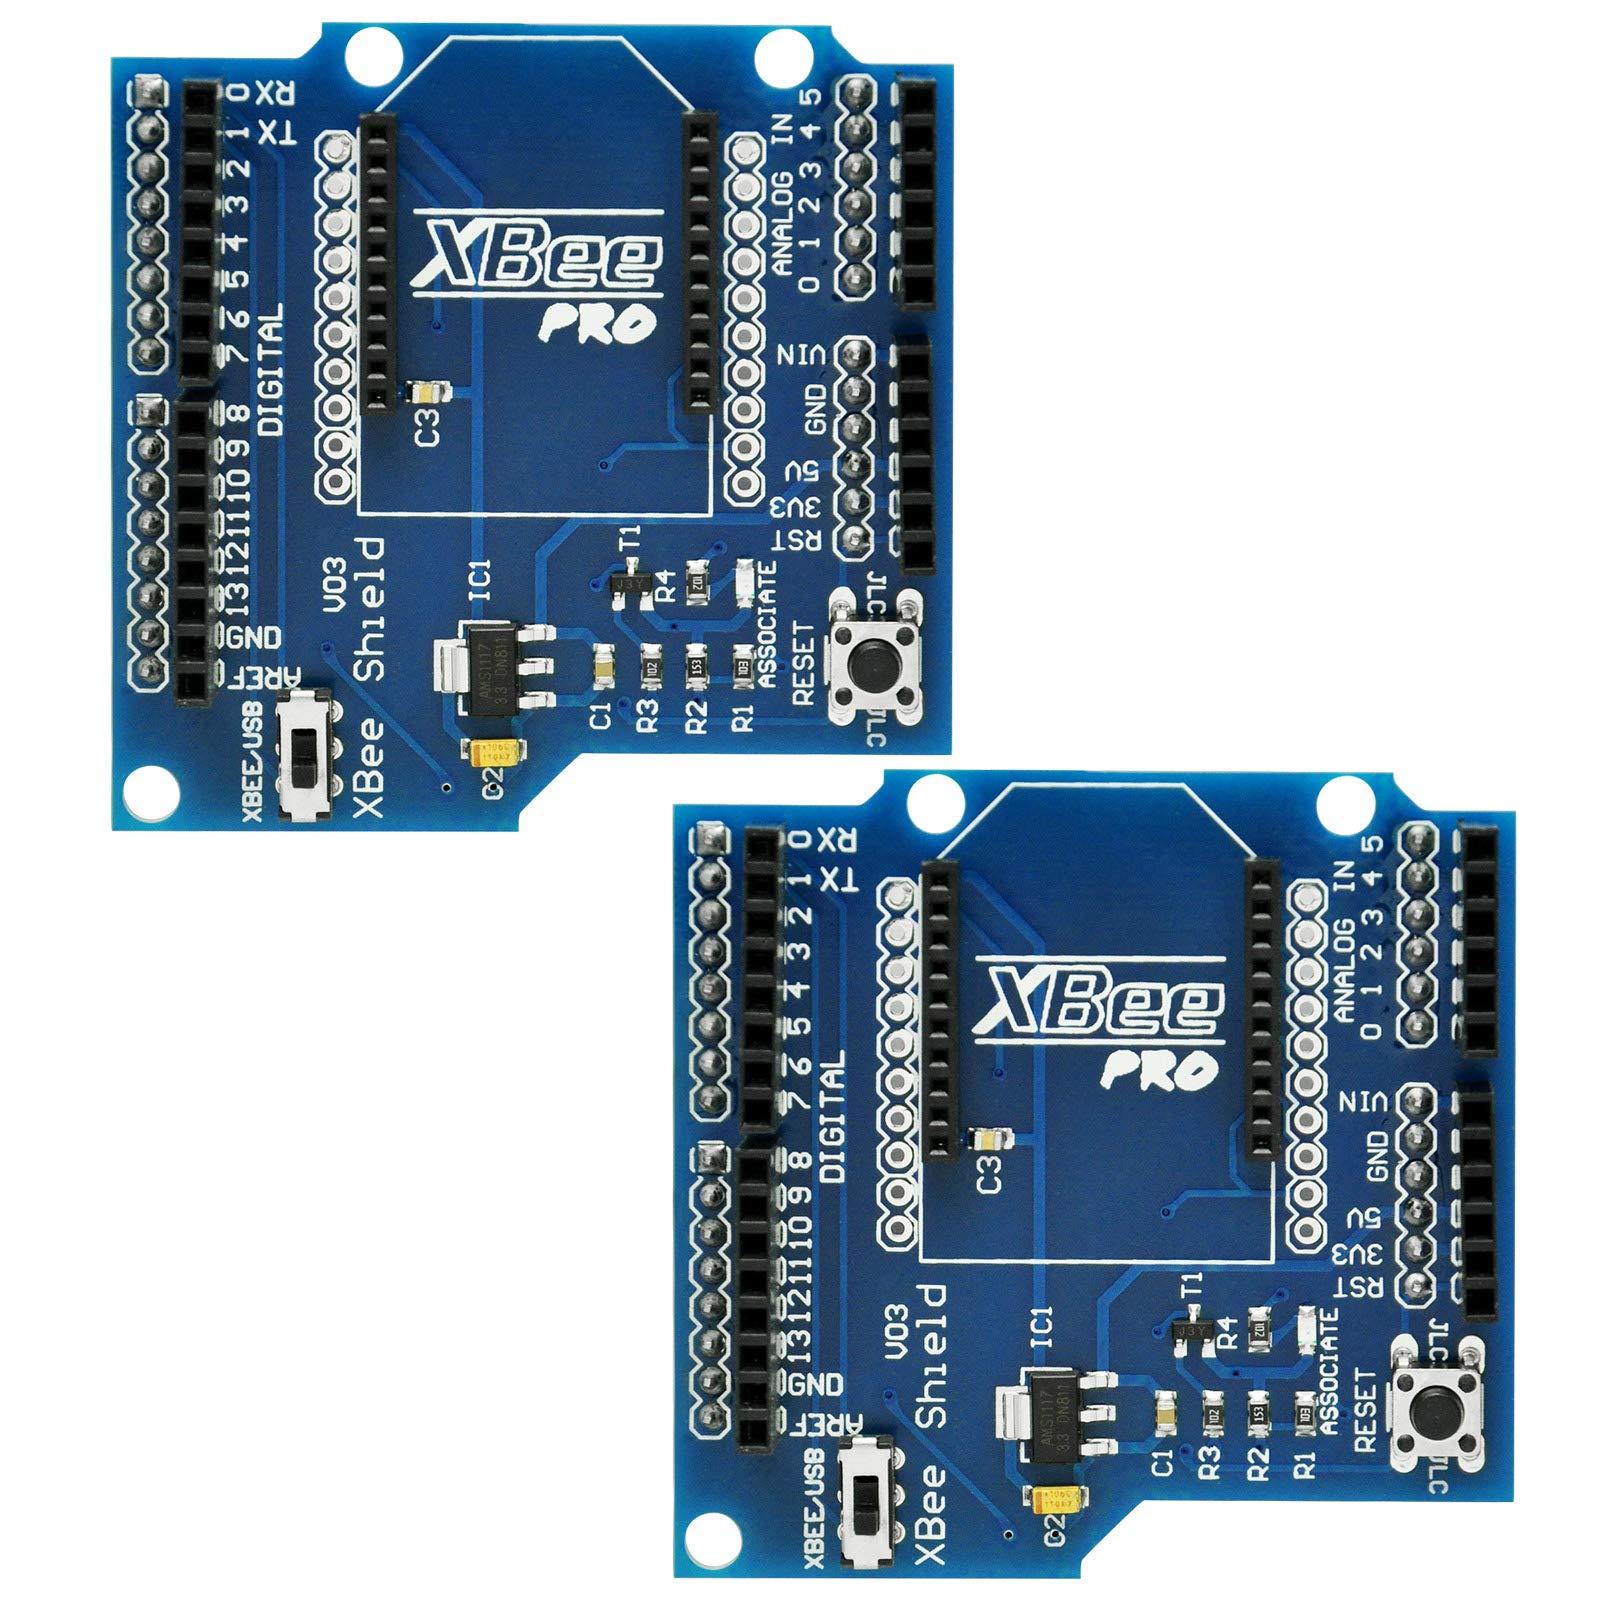 Gikfun Bluetooth XBee Shield V03 Module Wireless Control for ZigBee Arduino (Pack of 2pcs) EK1185x2 by Gikfun